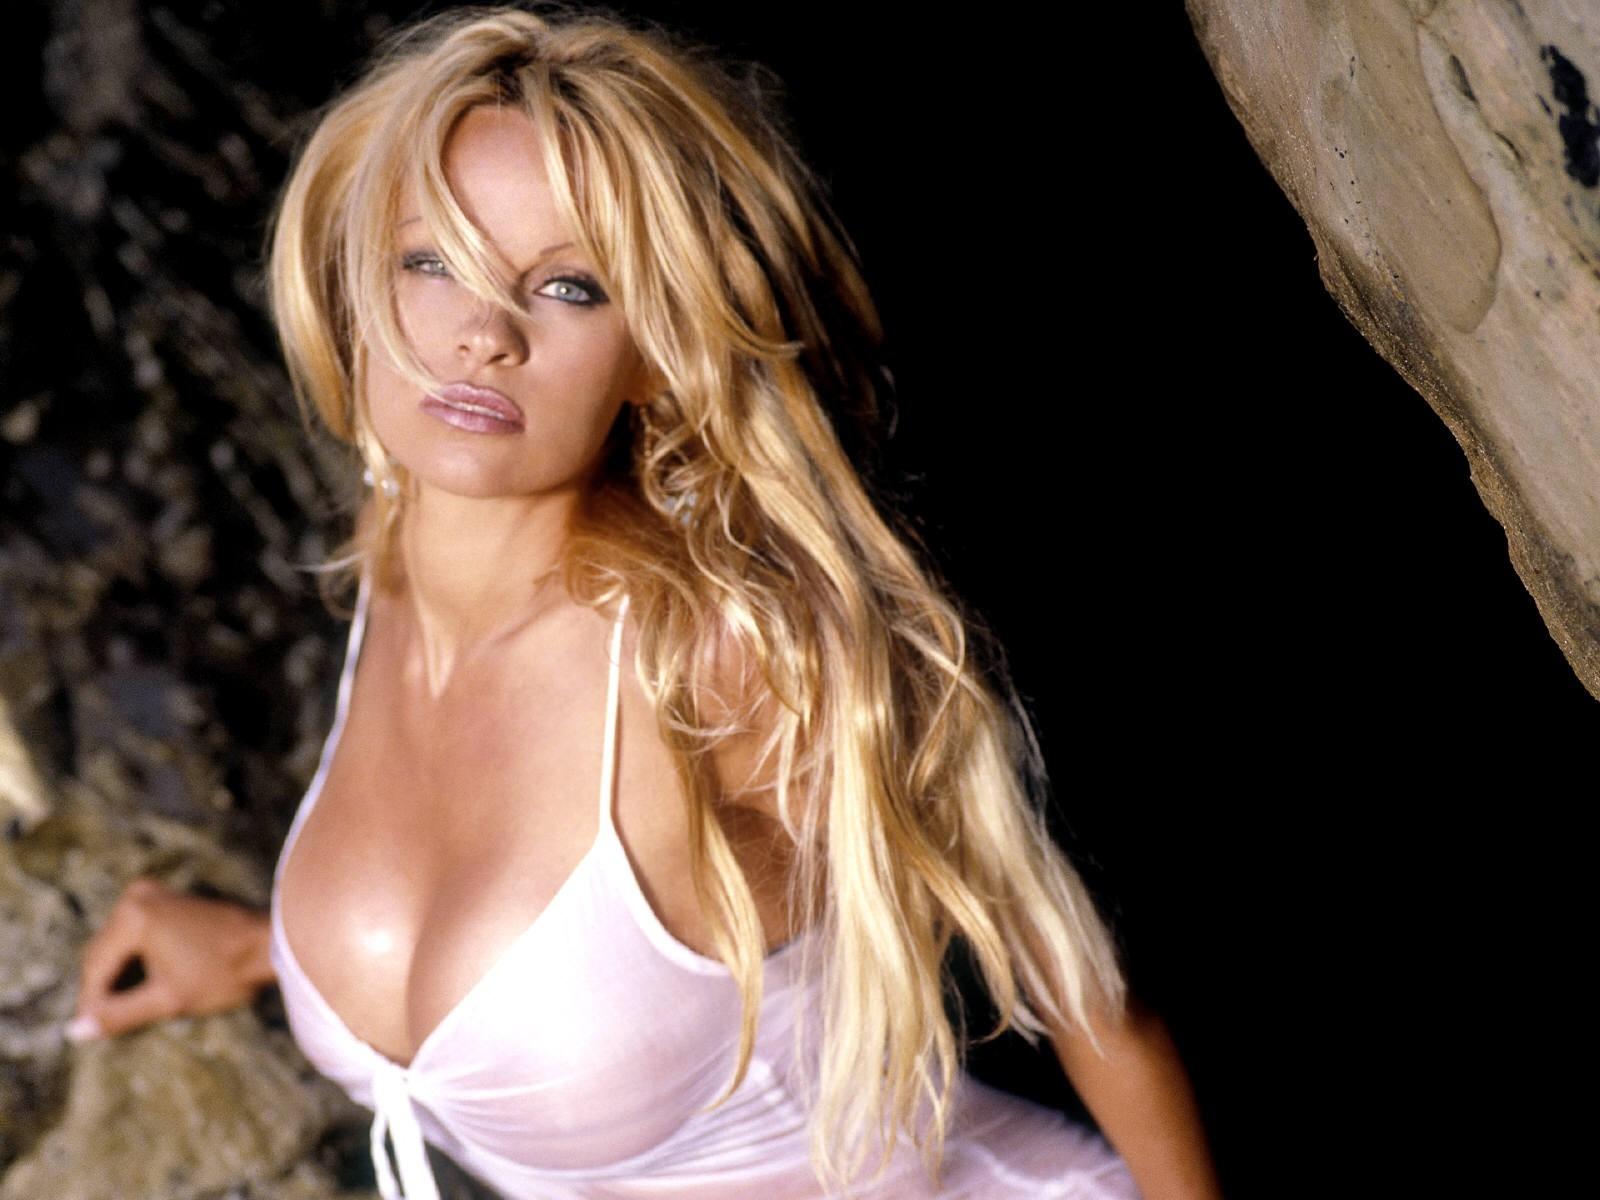 Wallpaper - curve esplosive per Pamela Anderson